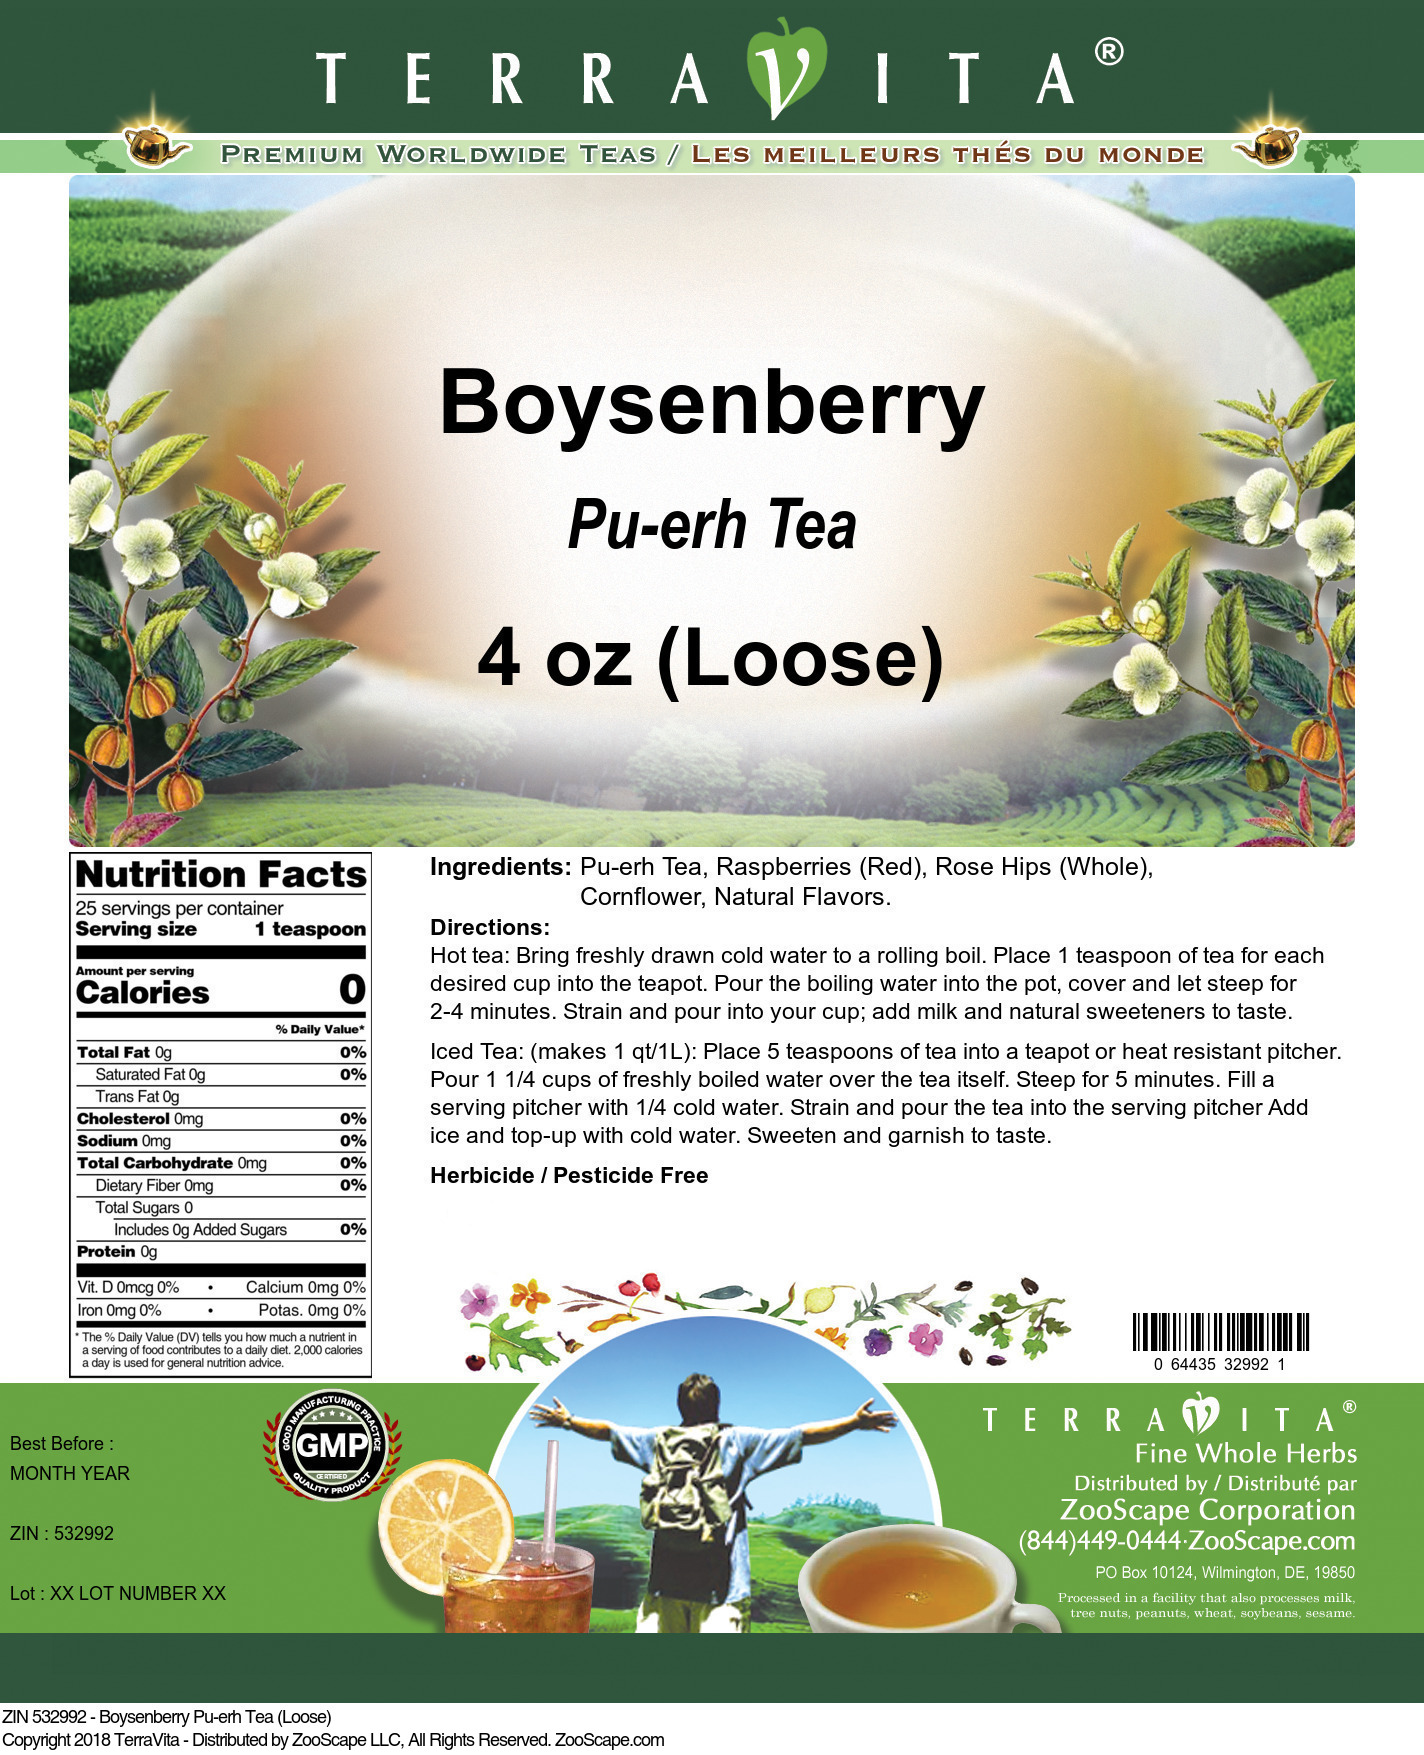 Boysenberry Pu-erh Tea (Loose)